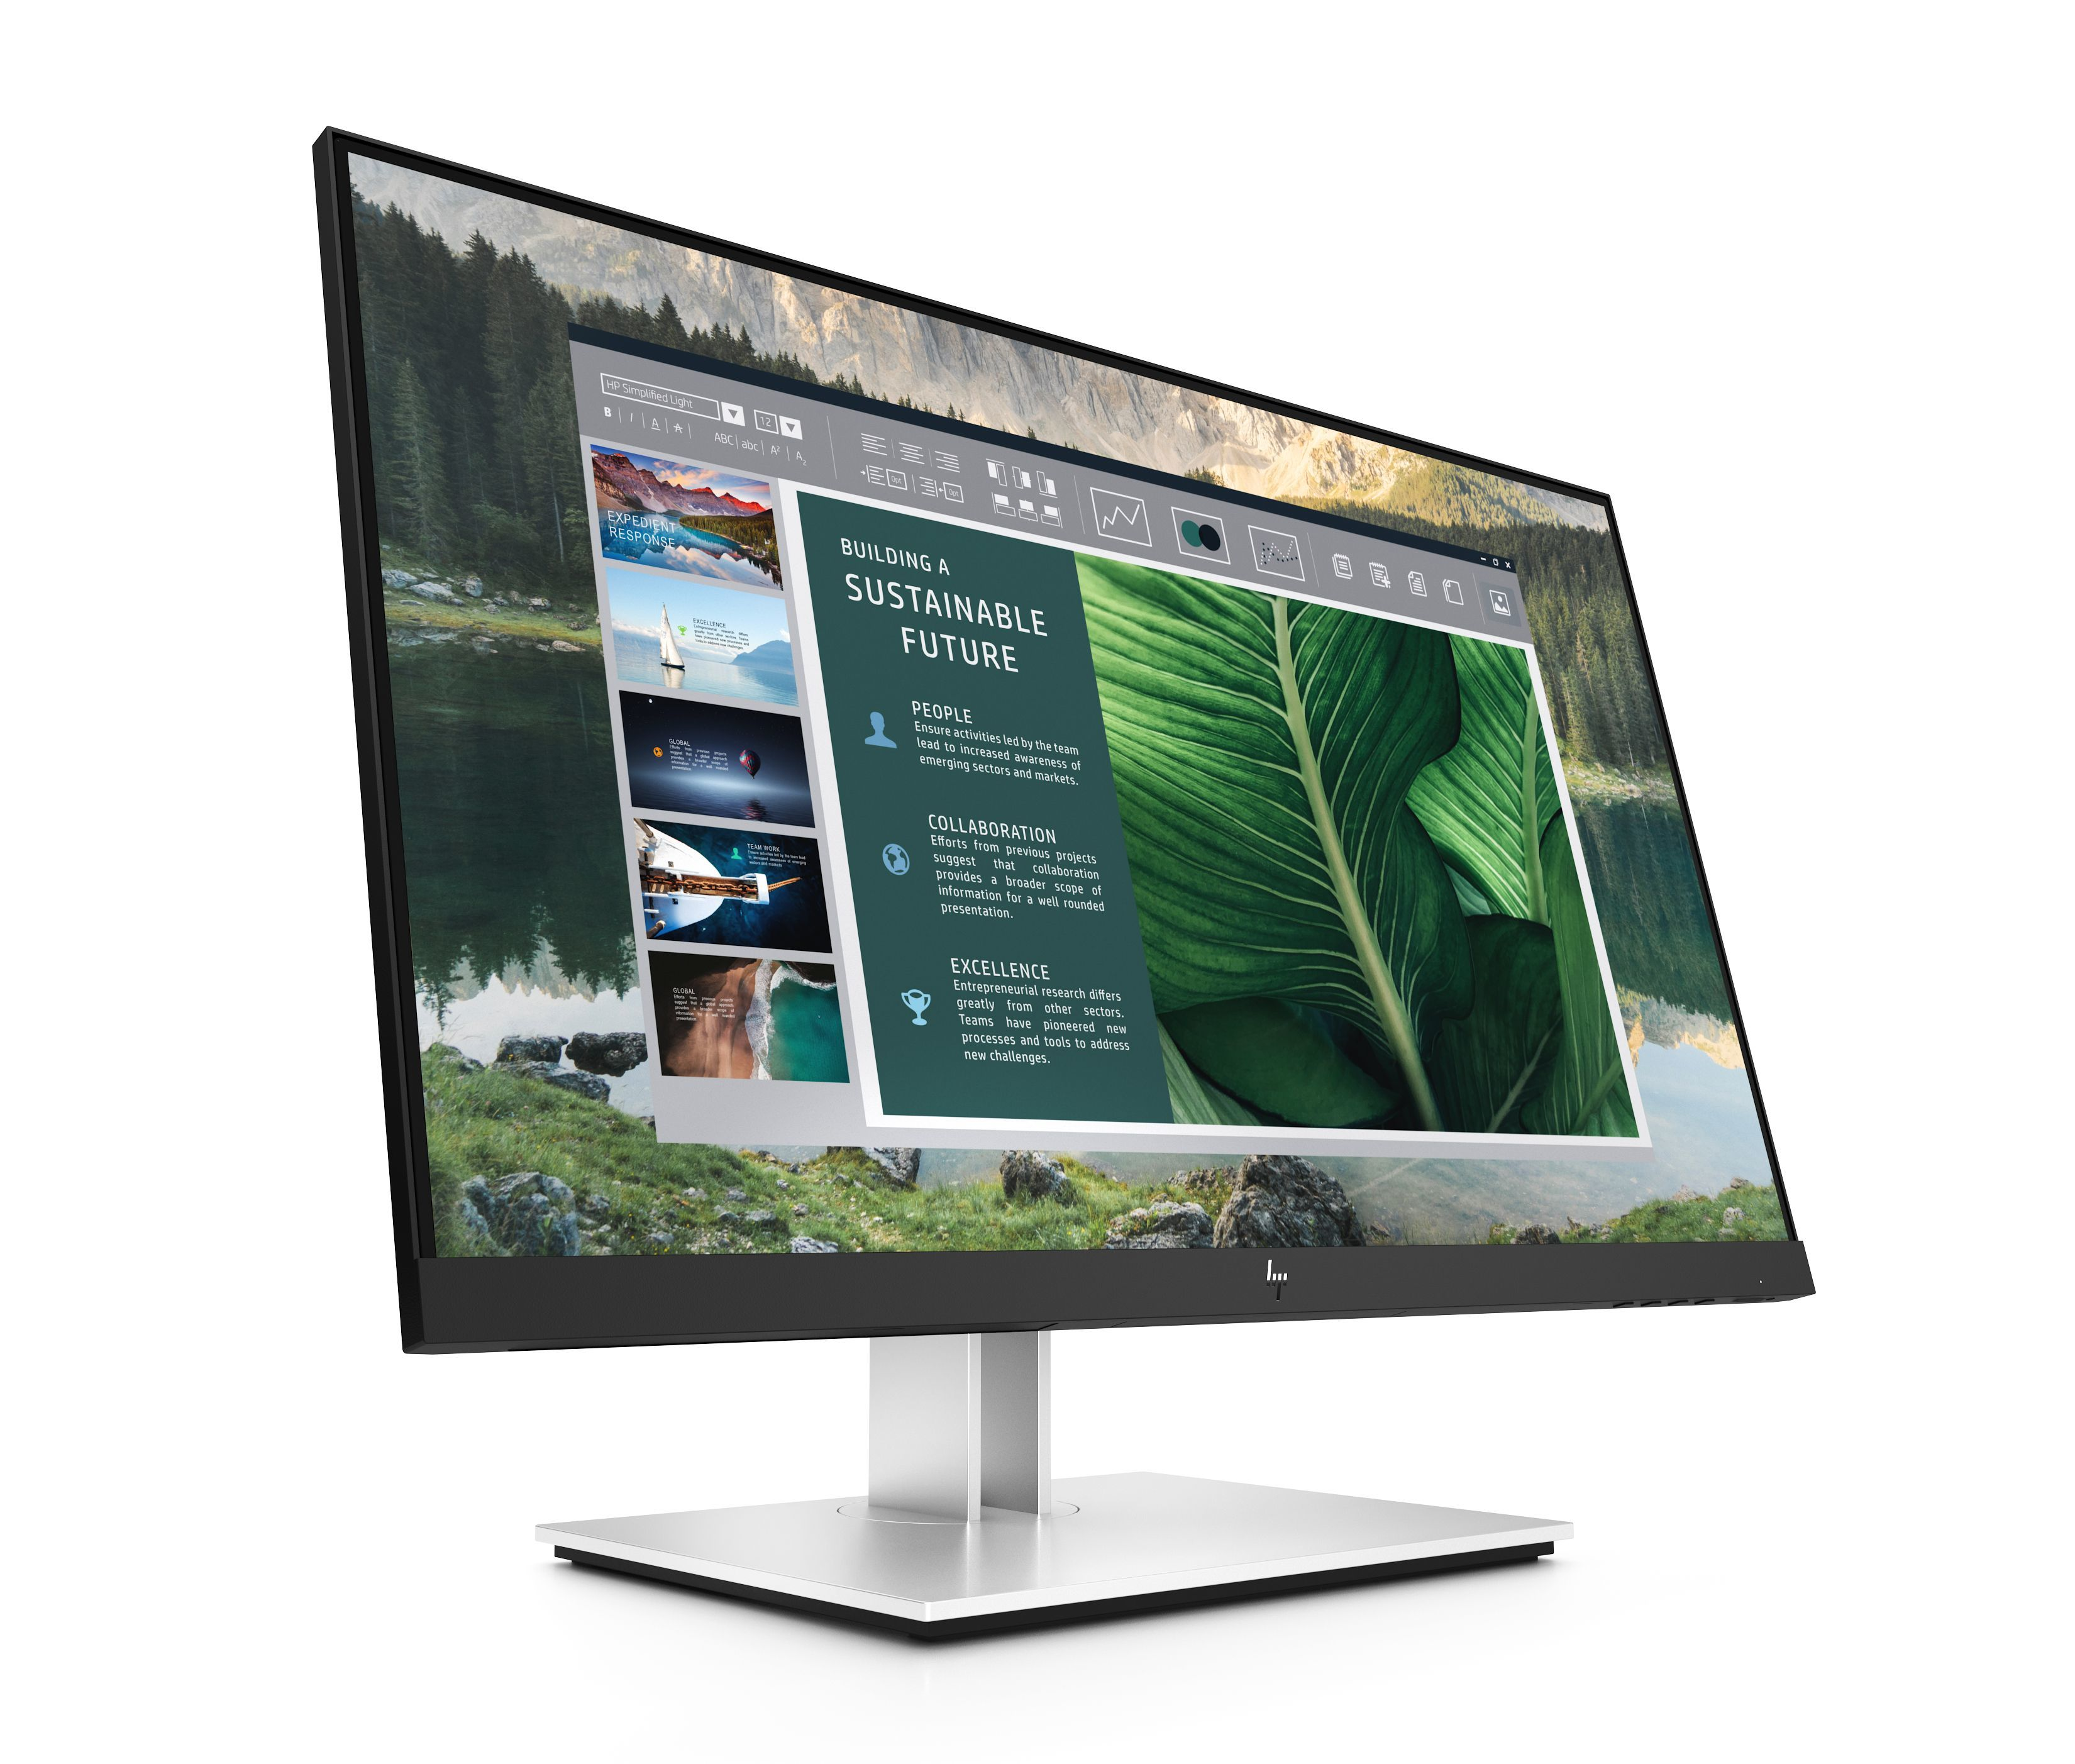 HP E series monitors